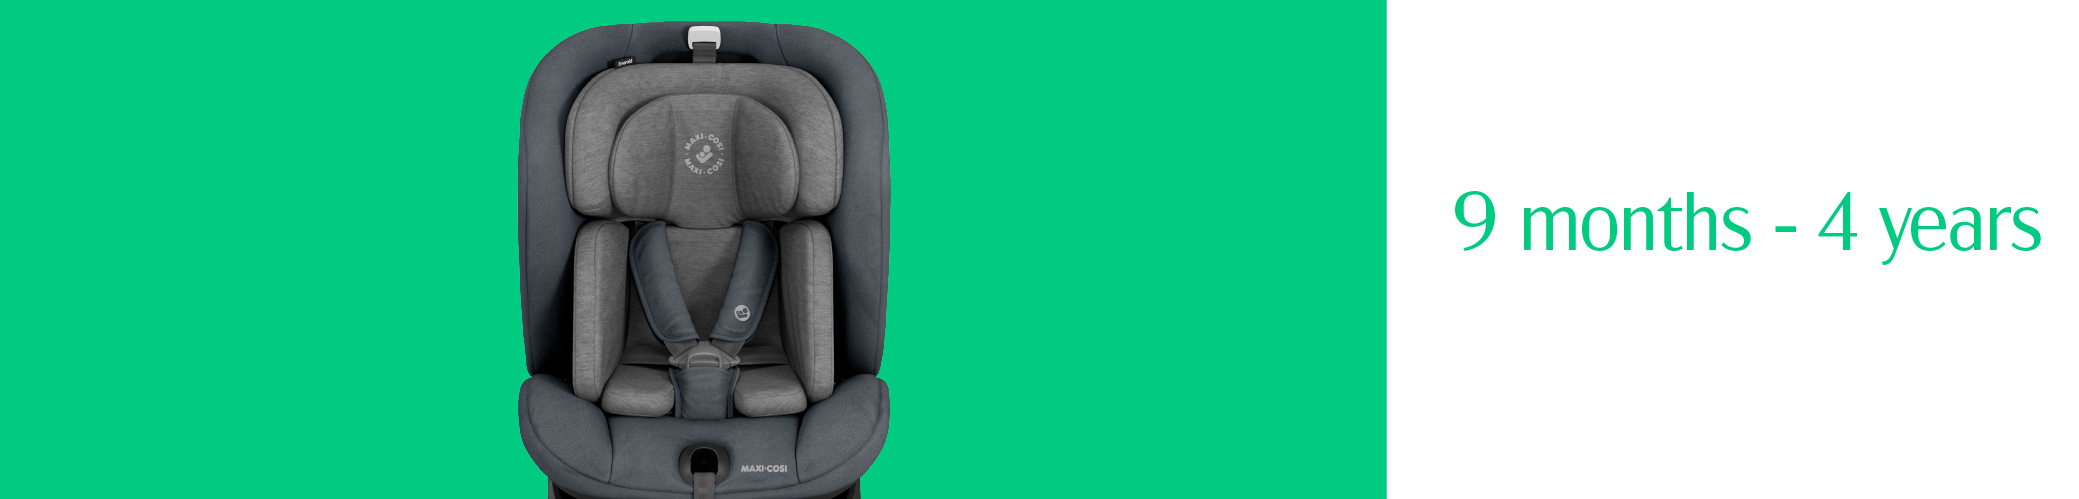 toddler in a grey maxi cosi car seat